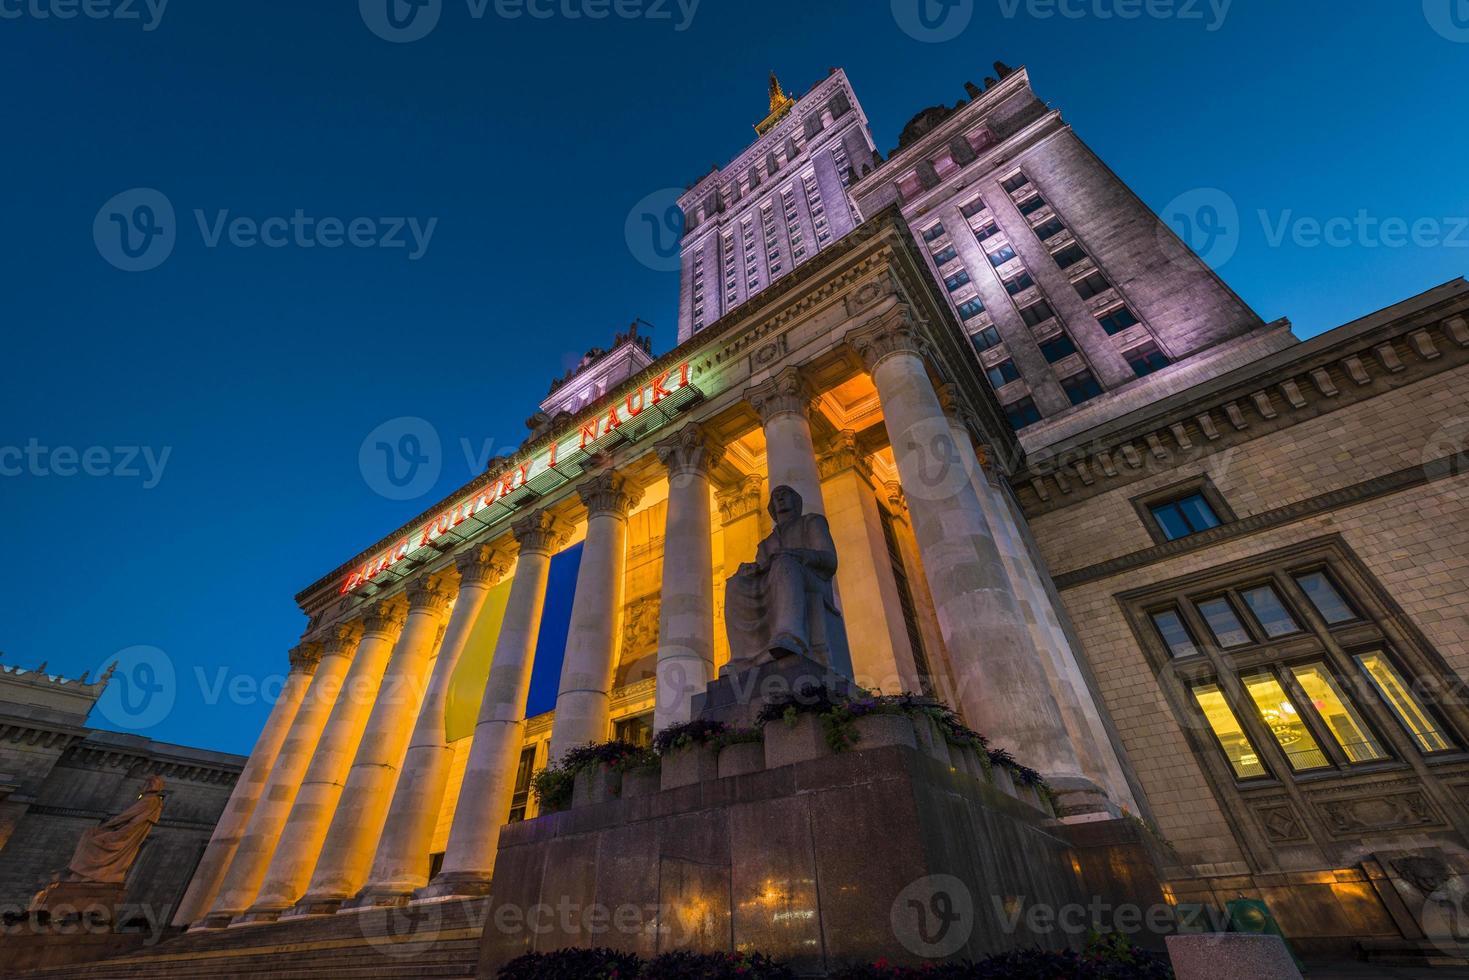 Paleis van cultuur in Warschau 's nachts foto